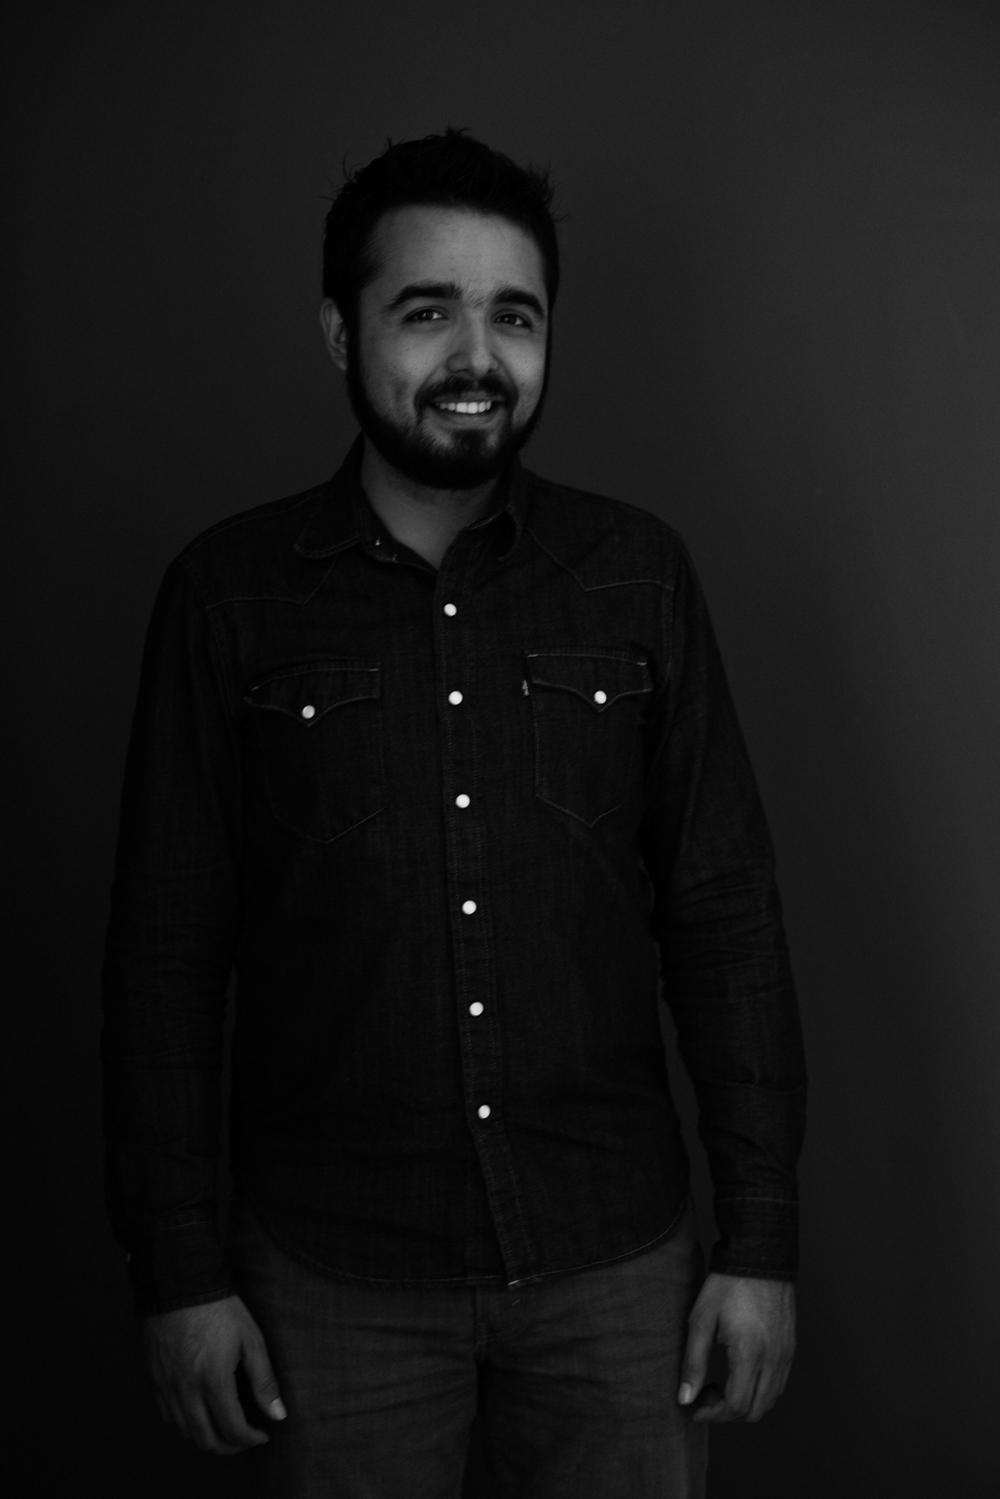 Sesion-fotos-mexicali-retrato-couples-Oscar-jeans-camisa-mezclilla-blanco-negro-stand